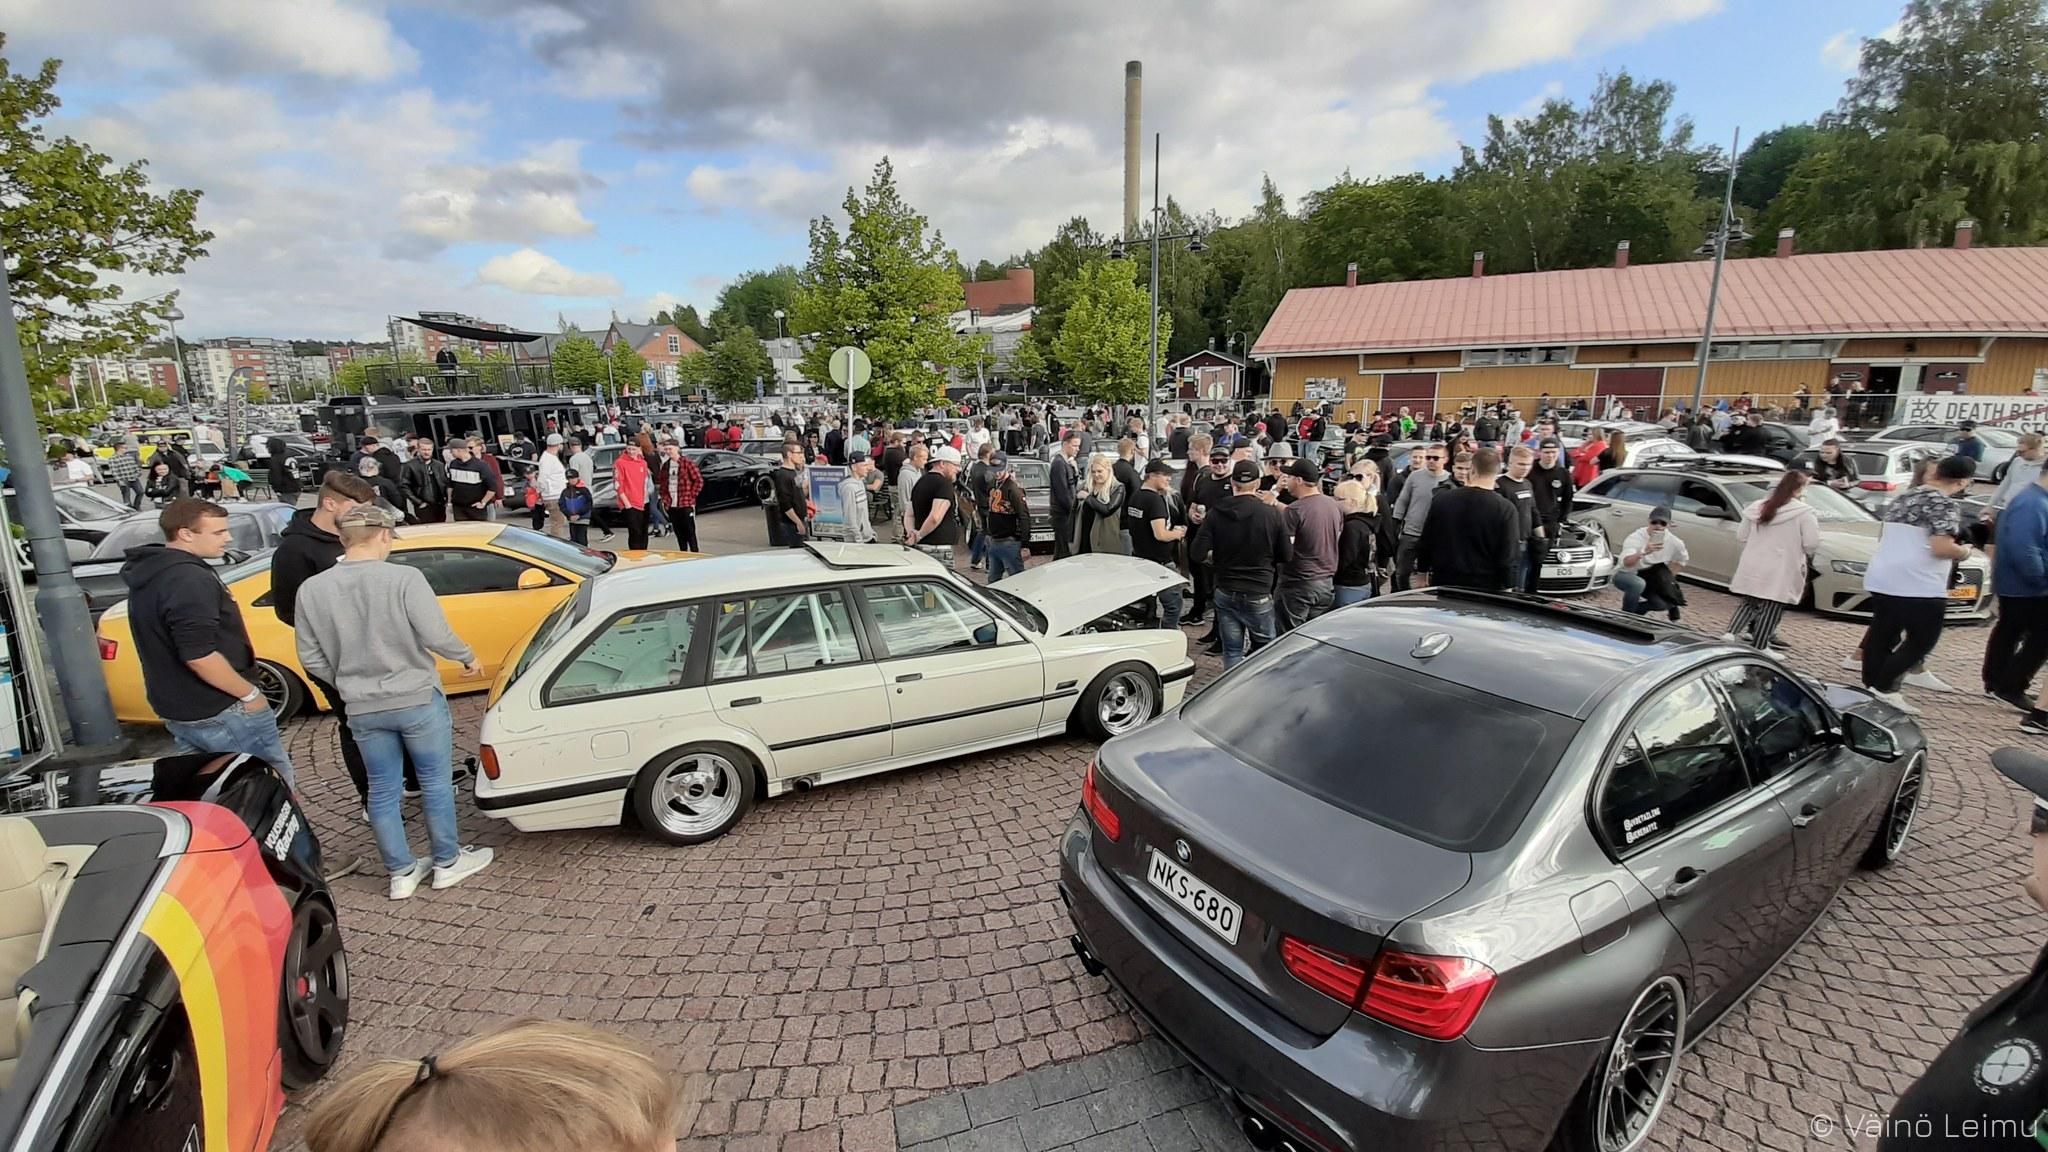 väizki: SaappiBemari ja muut murheenkryynit - Sivu 2 20190824_170858